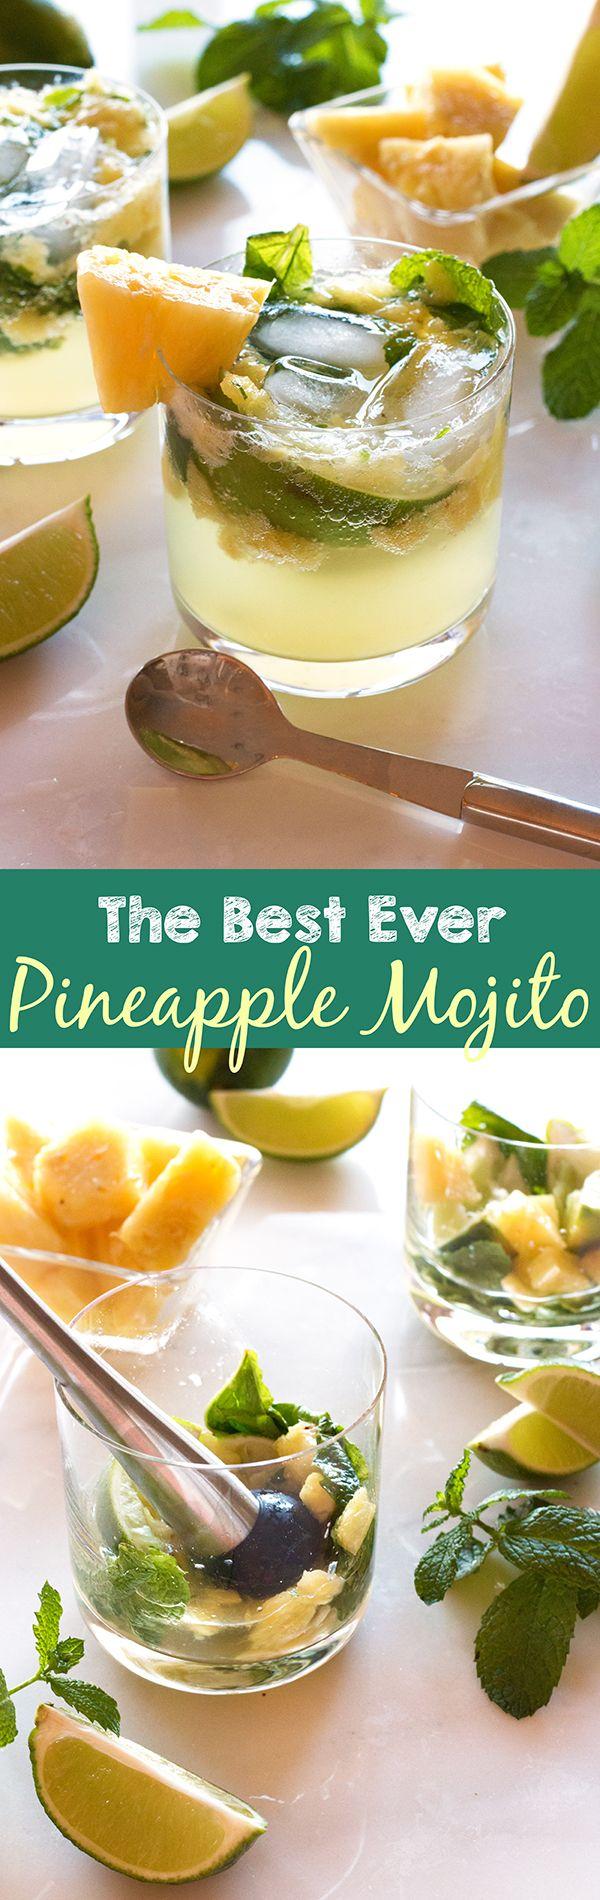 The Best Ever Pineapple Mojito | www.grainchanger.com